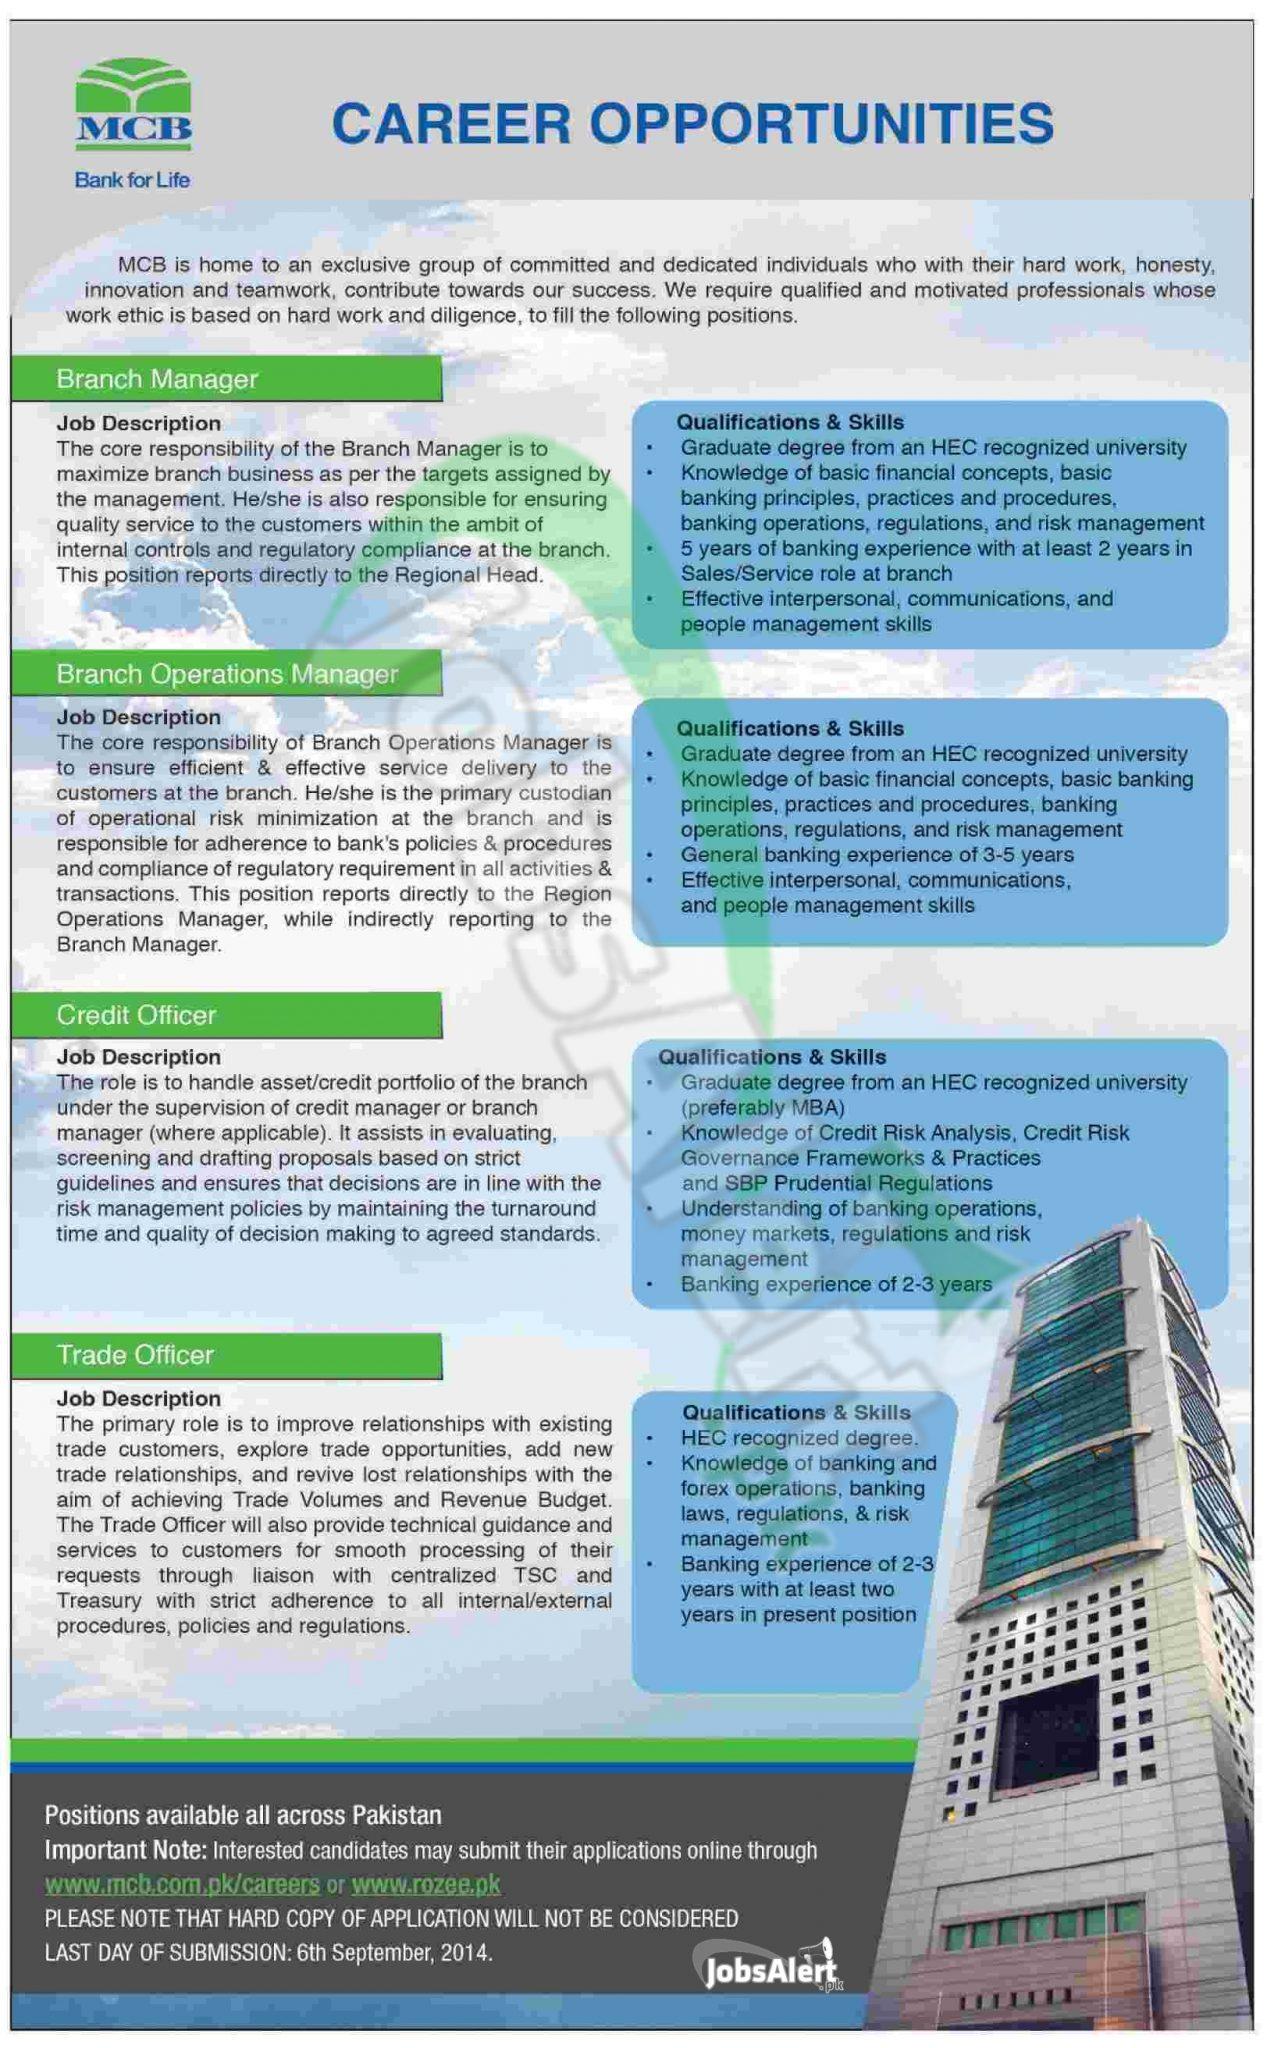 MCB Bank Pakistan